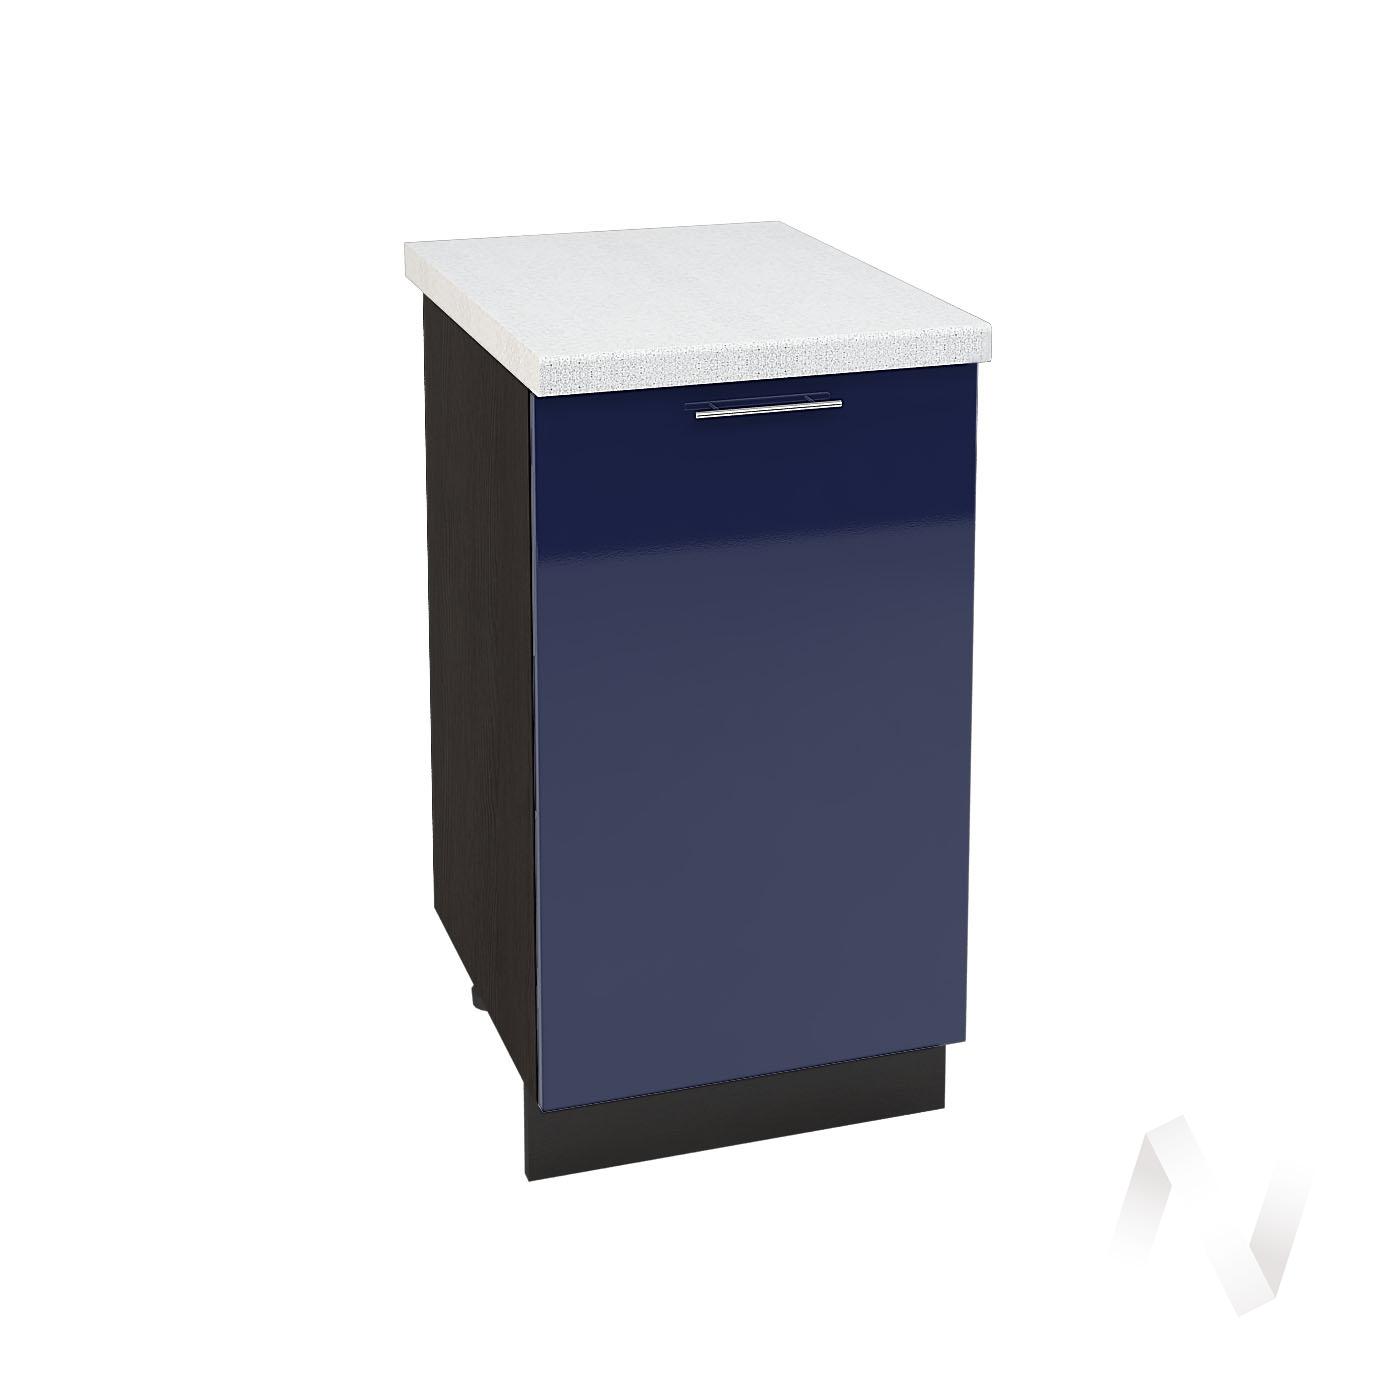 "Кухня ""Валерия-М"": Шкаф нижний 450, ШН 450 (Синий глянец/корпус венге)"